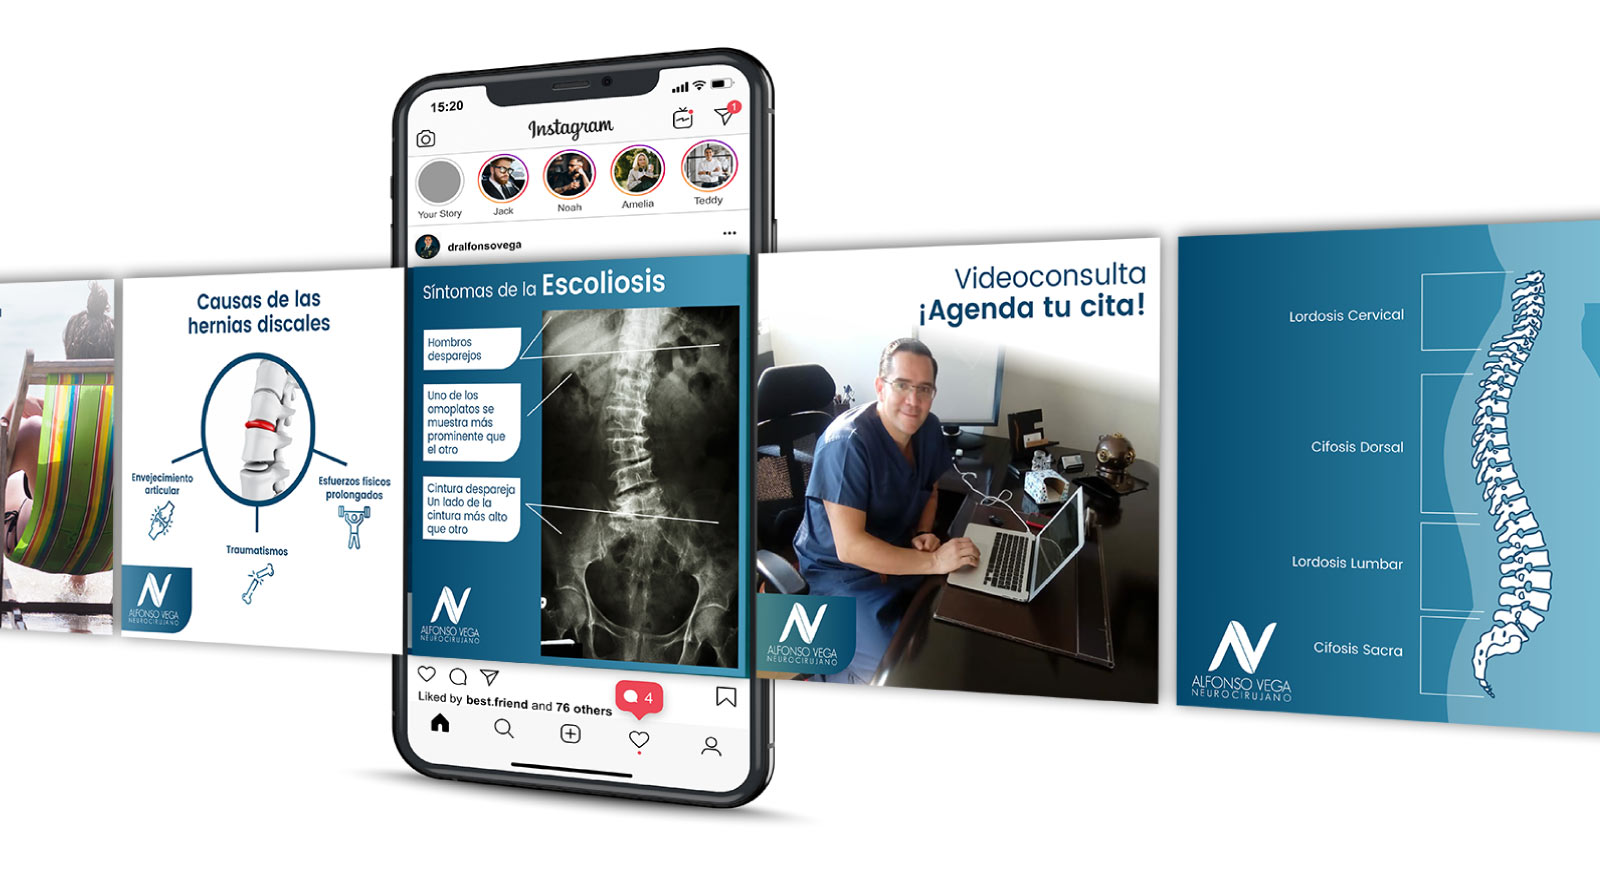 Diseño gráfico para el canal Social Media del Dr. Alfonso Vega